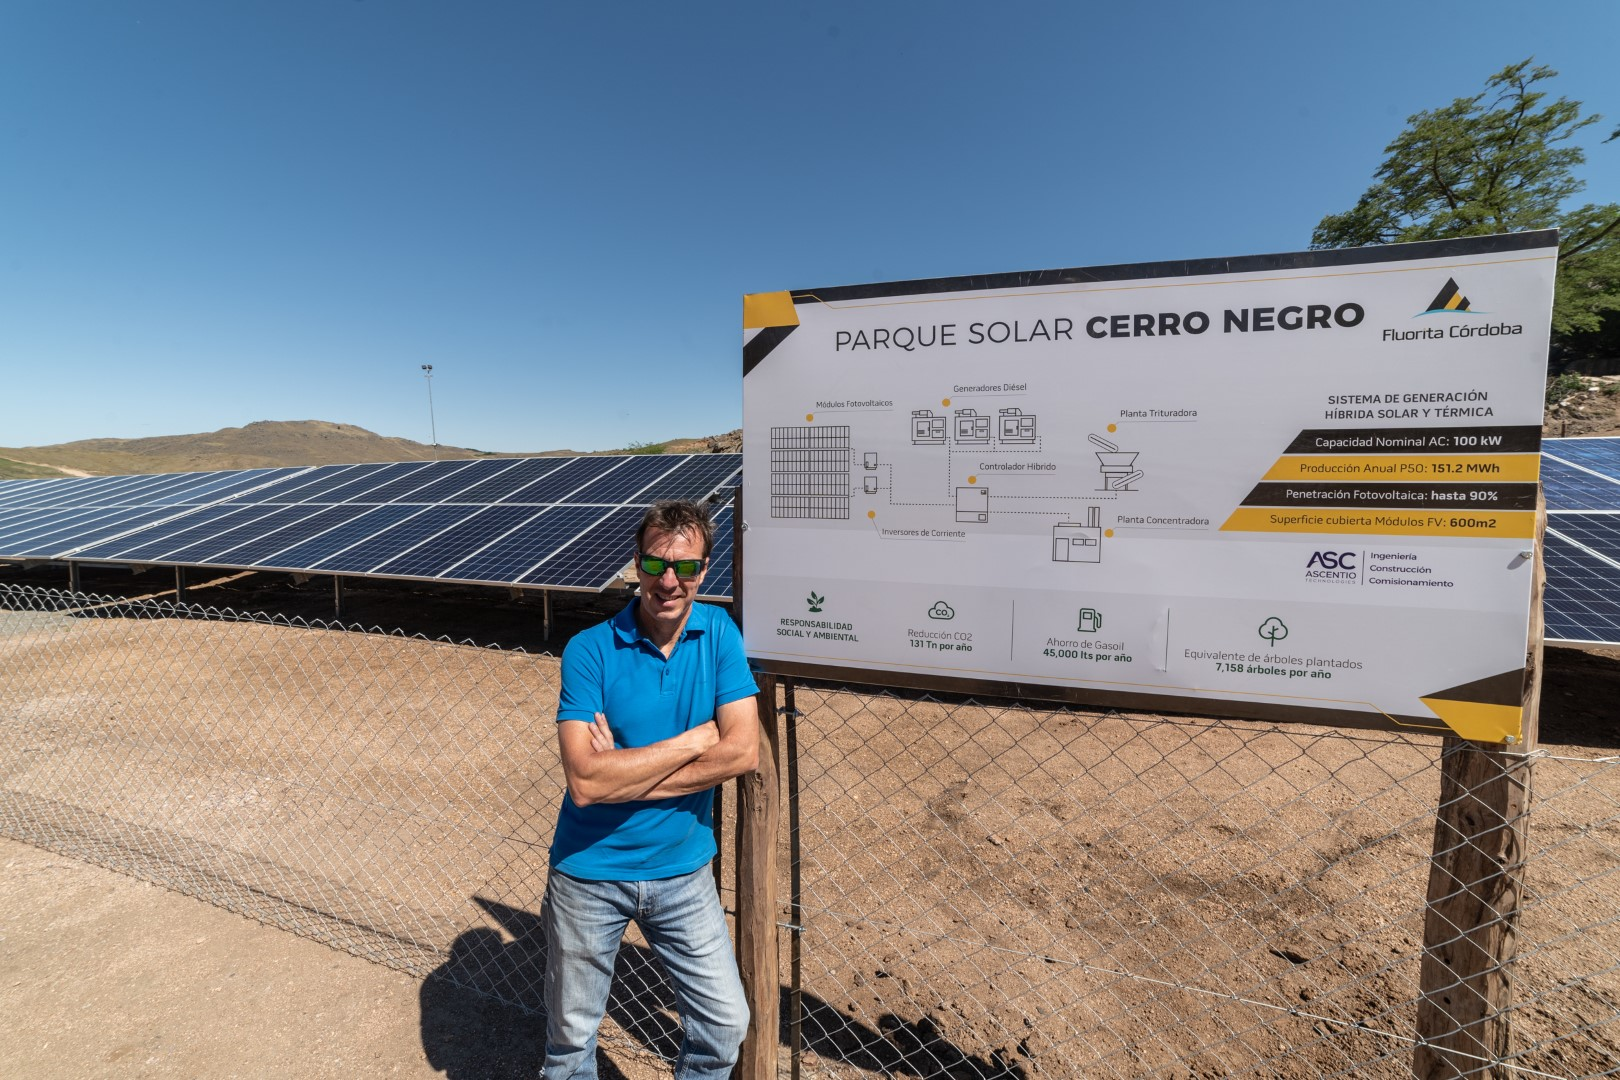 Parque Solar en Cordova, Argentina